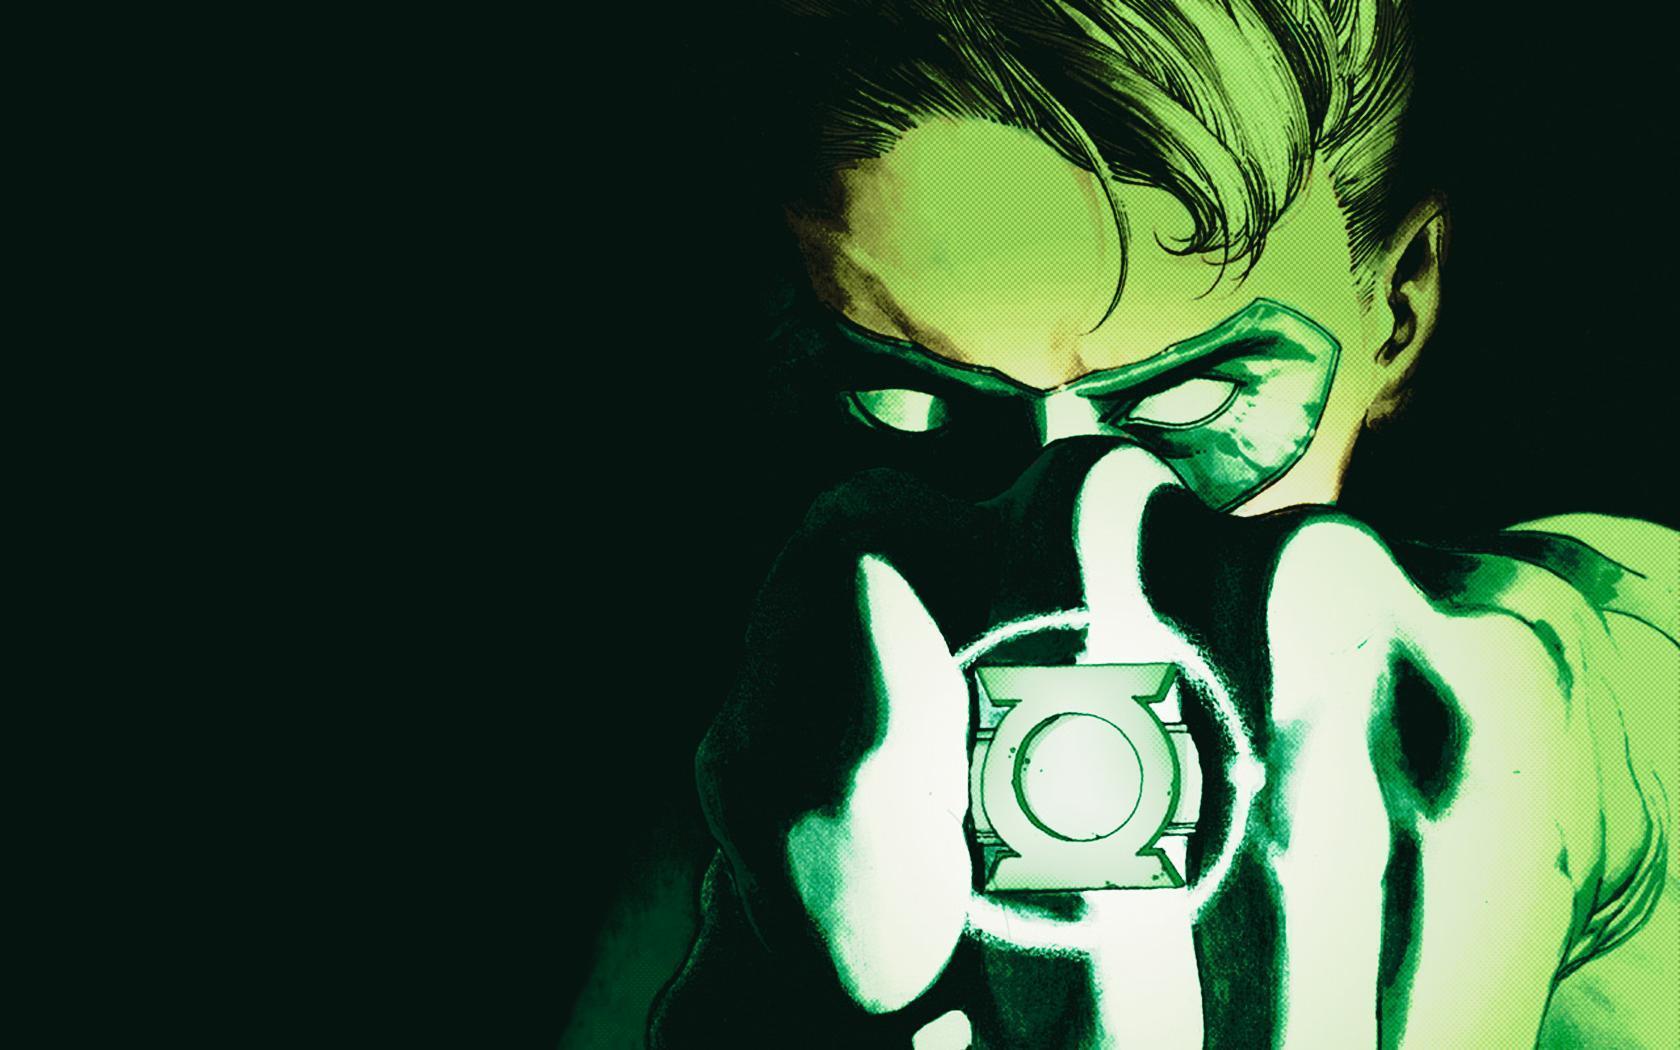 Green Lantern Wallpapers HD - Wallpaper Cave